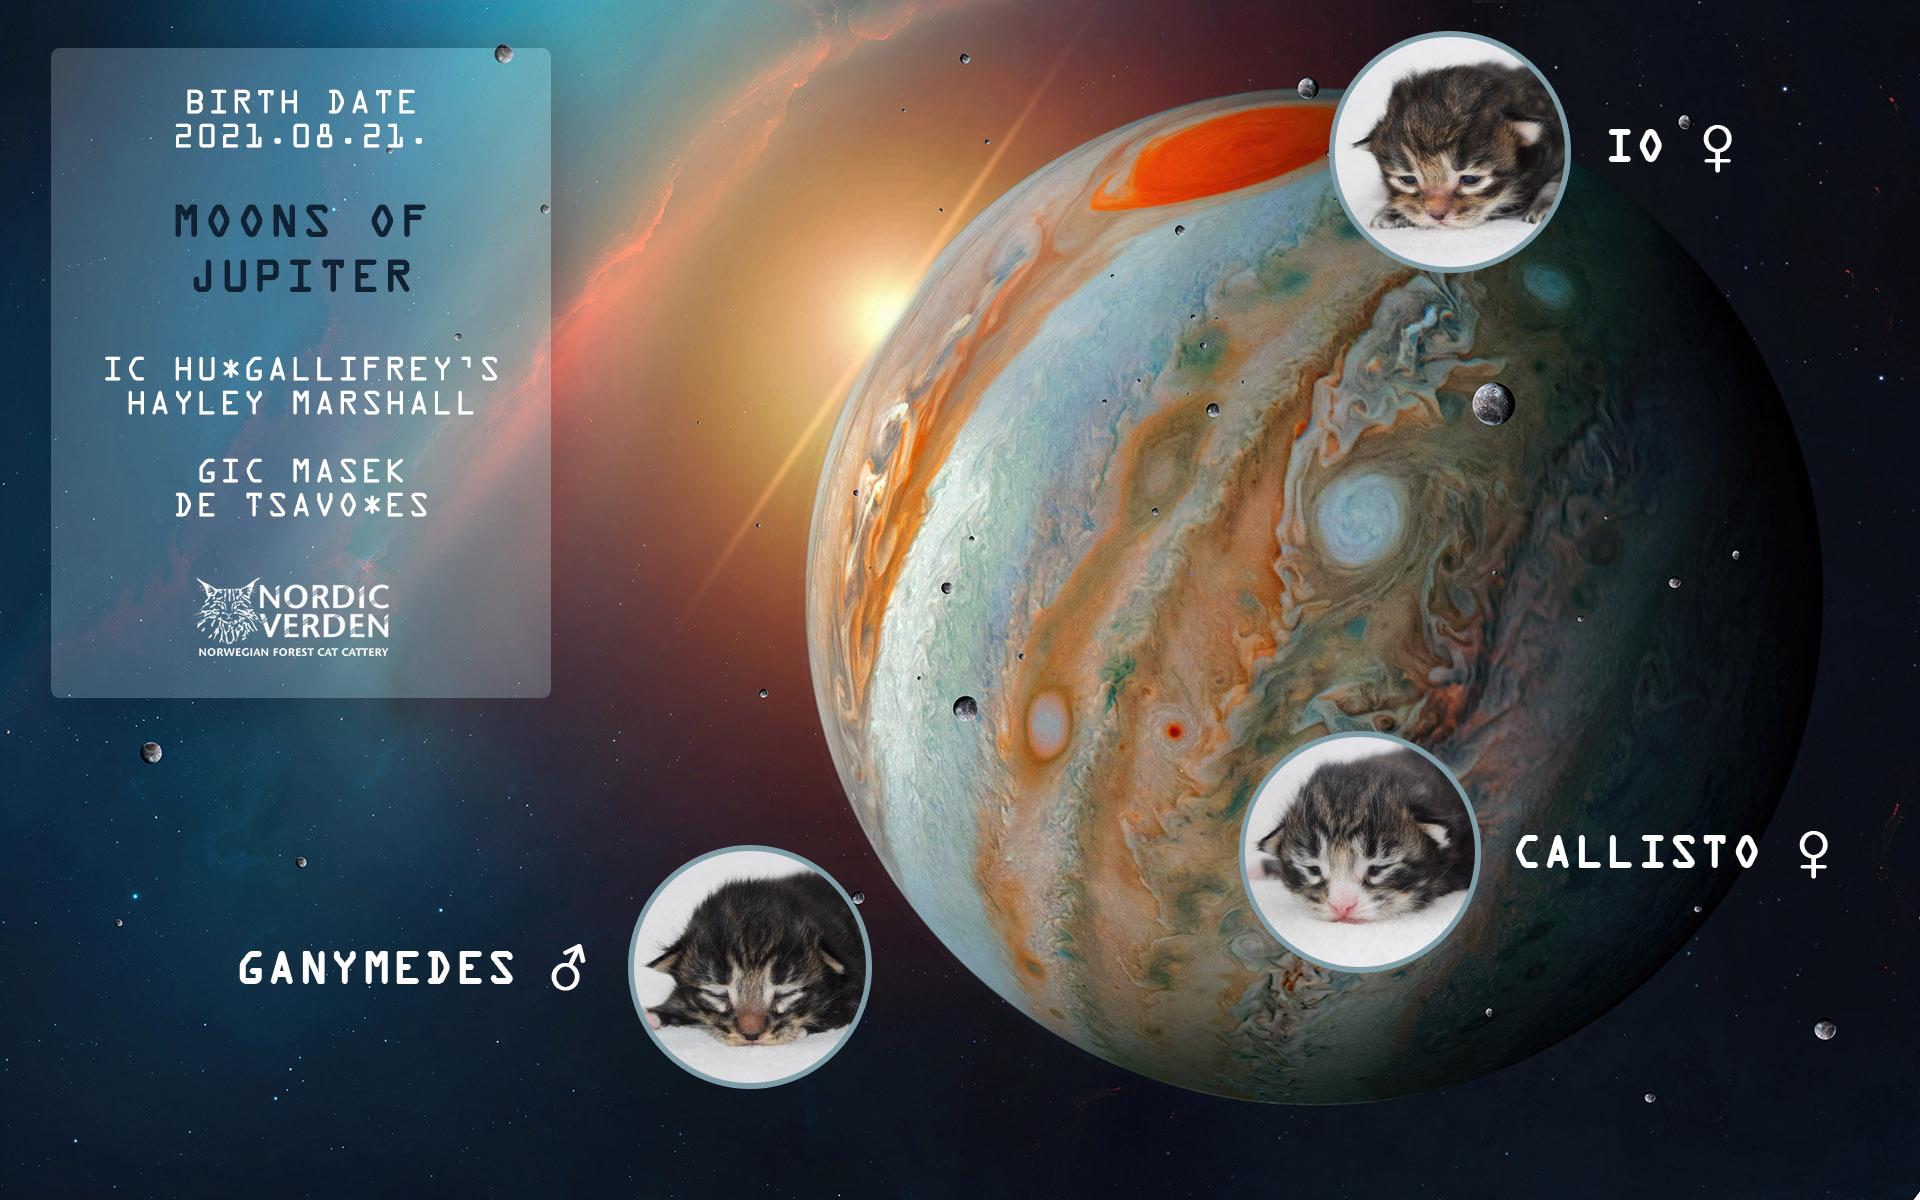 Nordic Verden - norvég erdei macska tenyészet - Moons of Jupiter alom